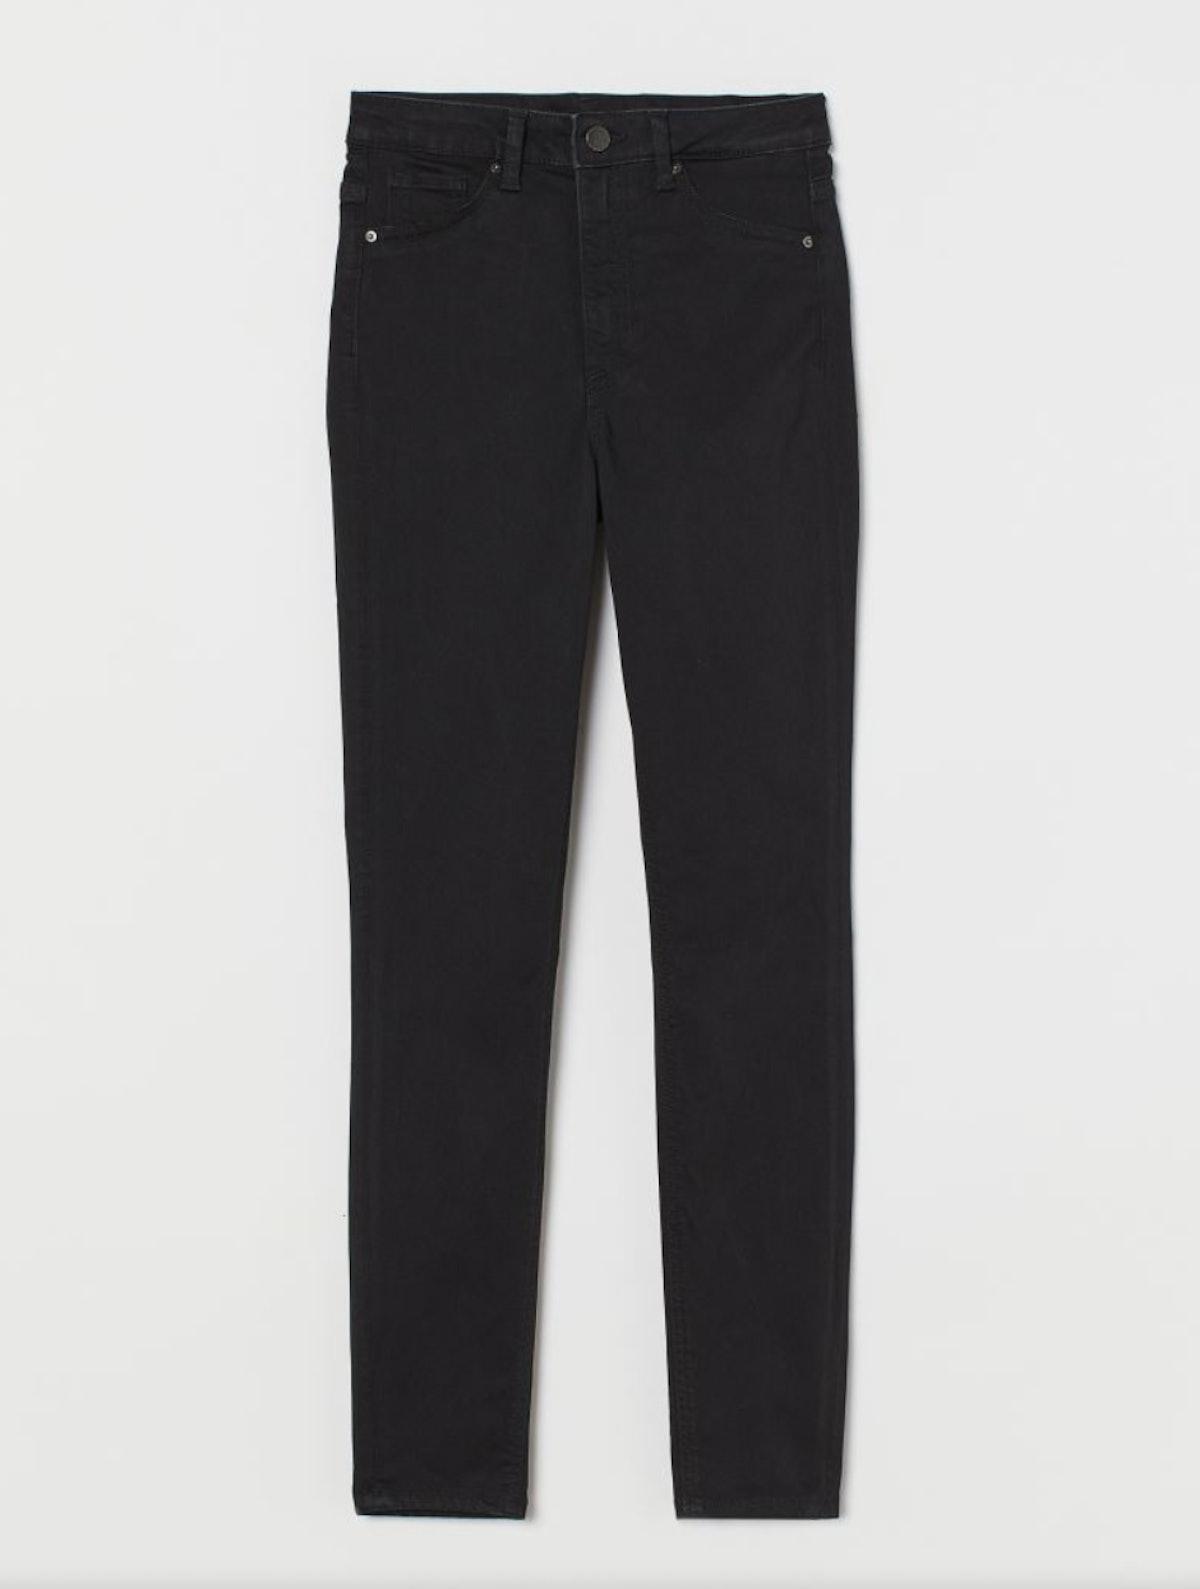 H&M's Curvy High Waist Jeggings in black.